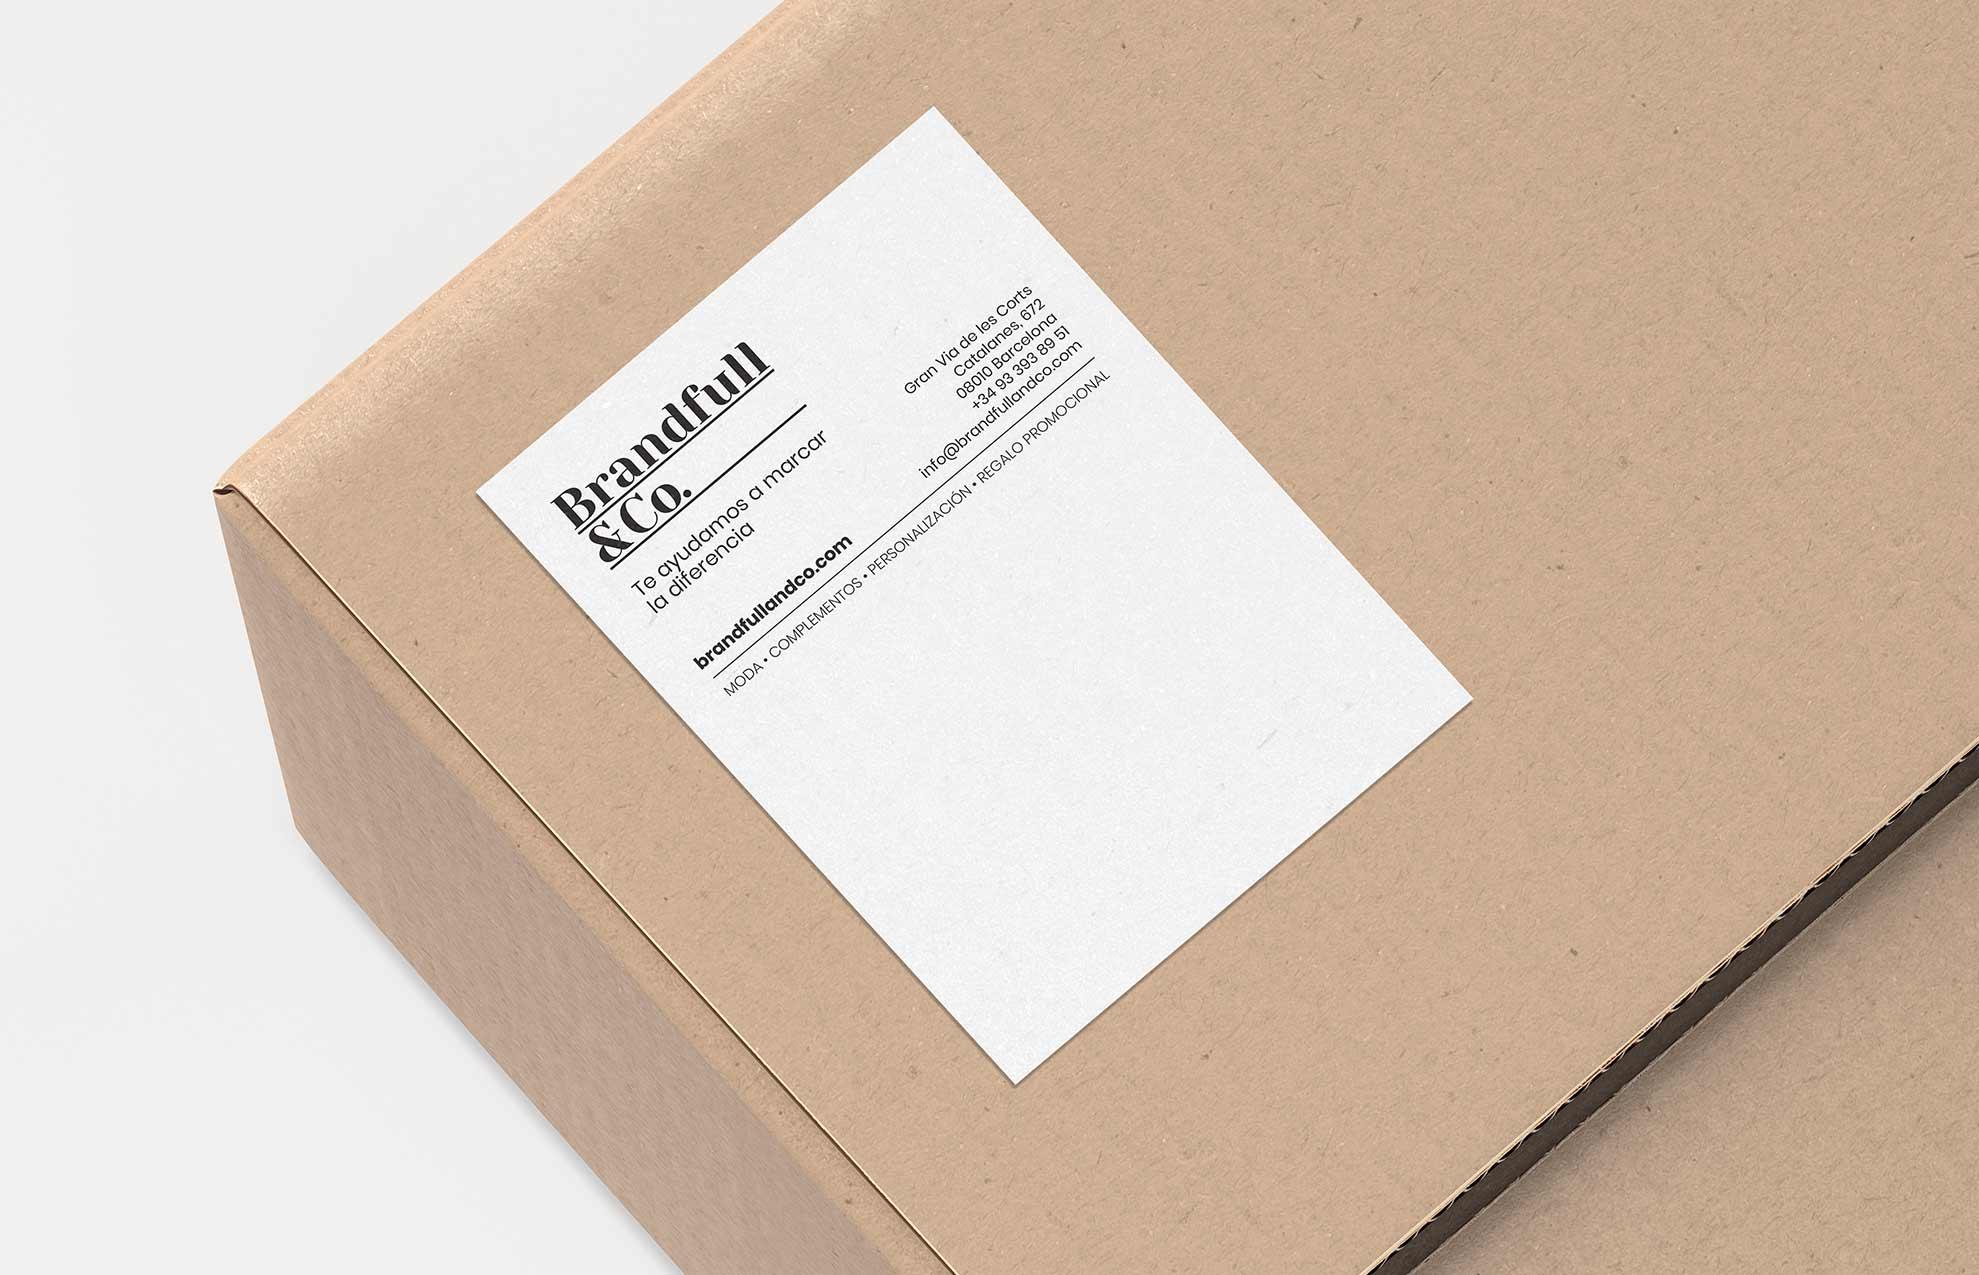 diseno adhesivo empresa ropa - Brandfull&Co, un proyecto integral de diseño